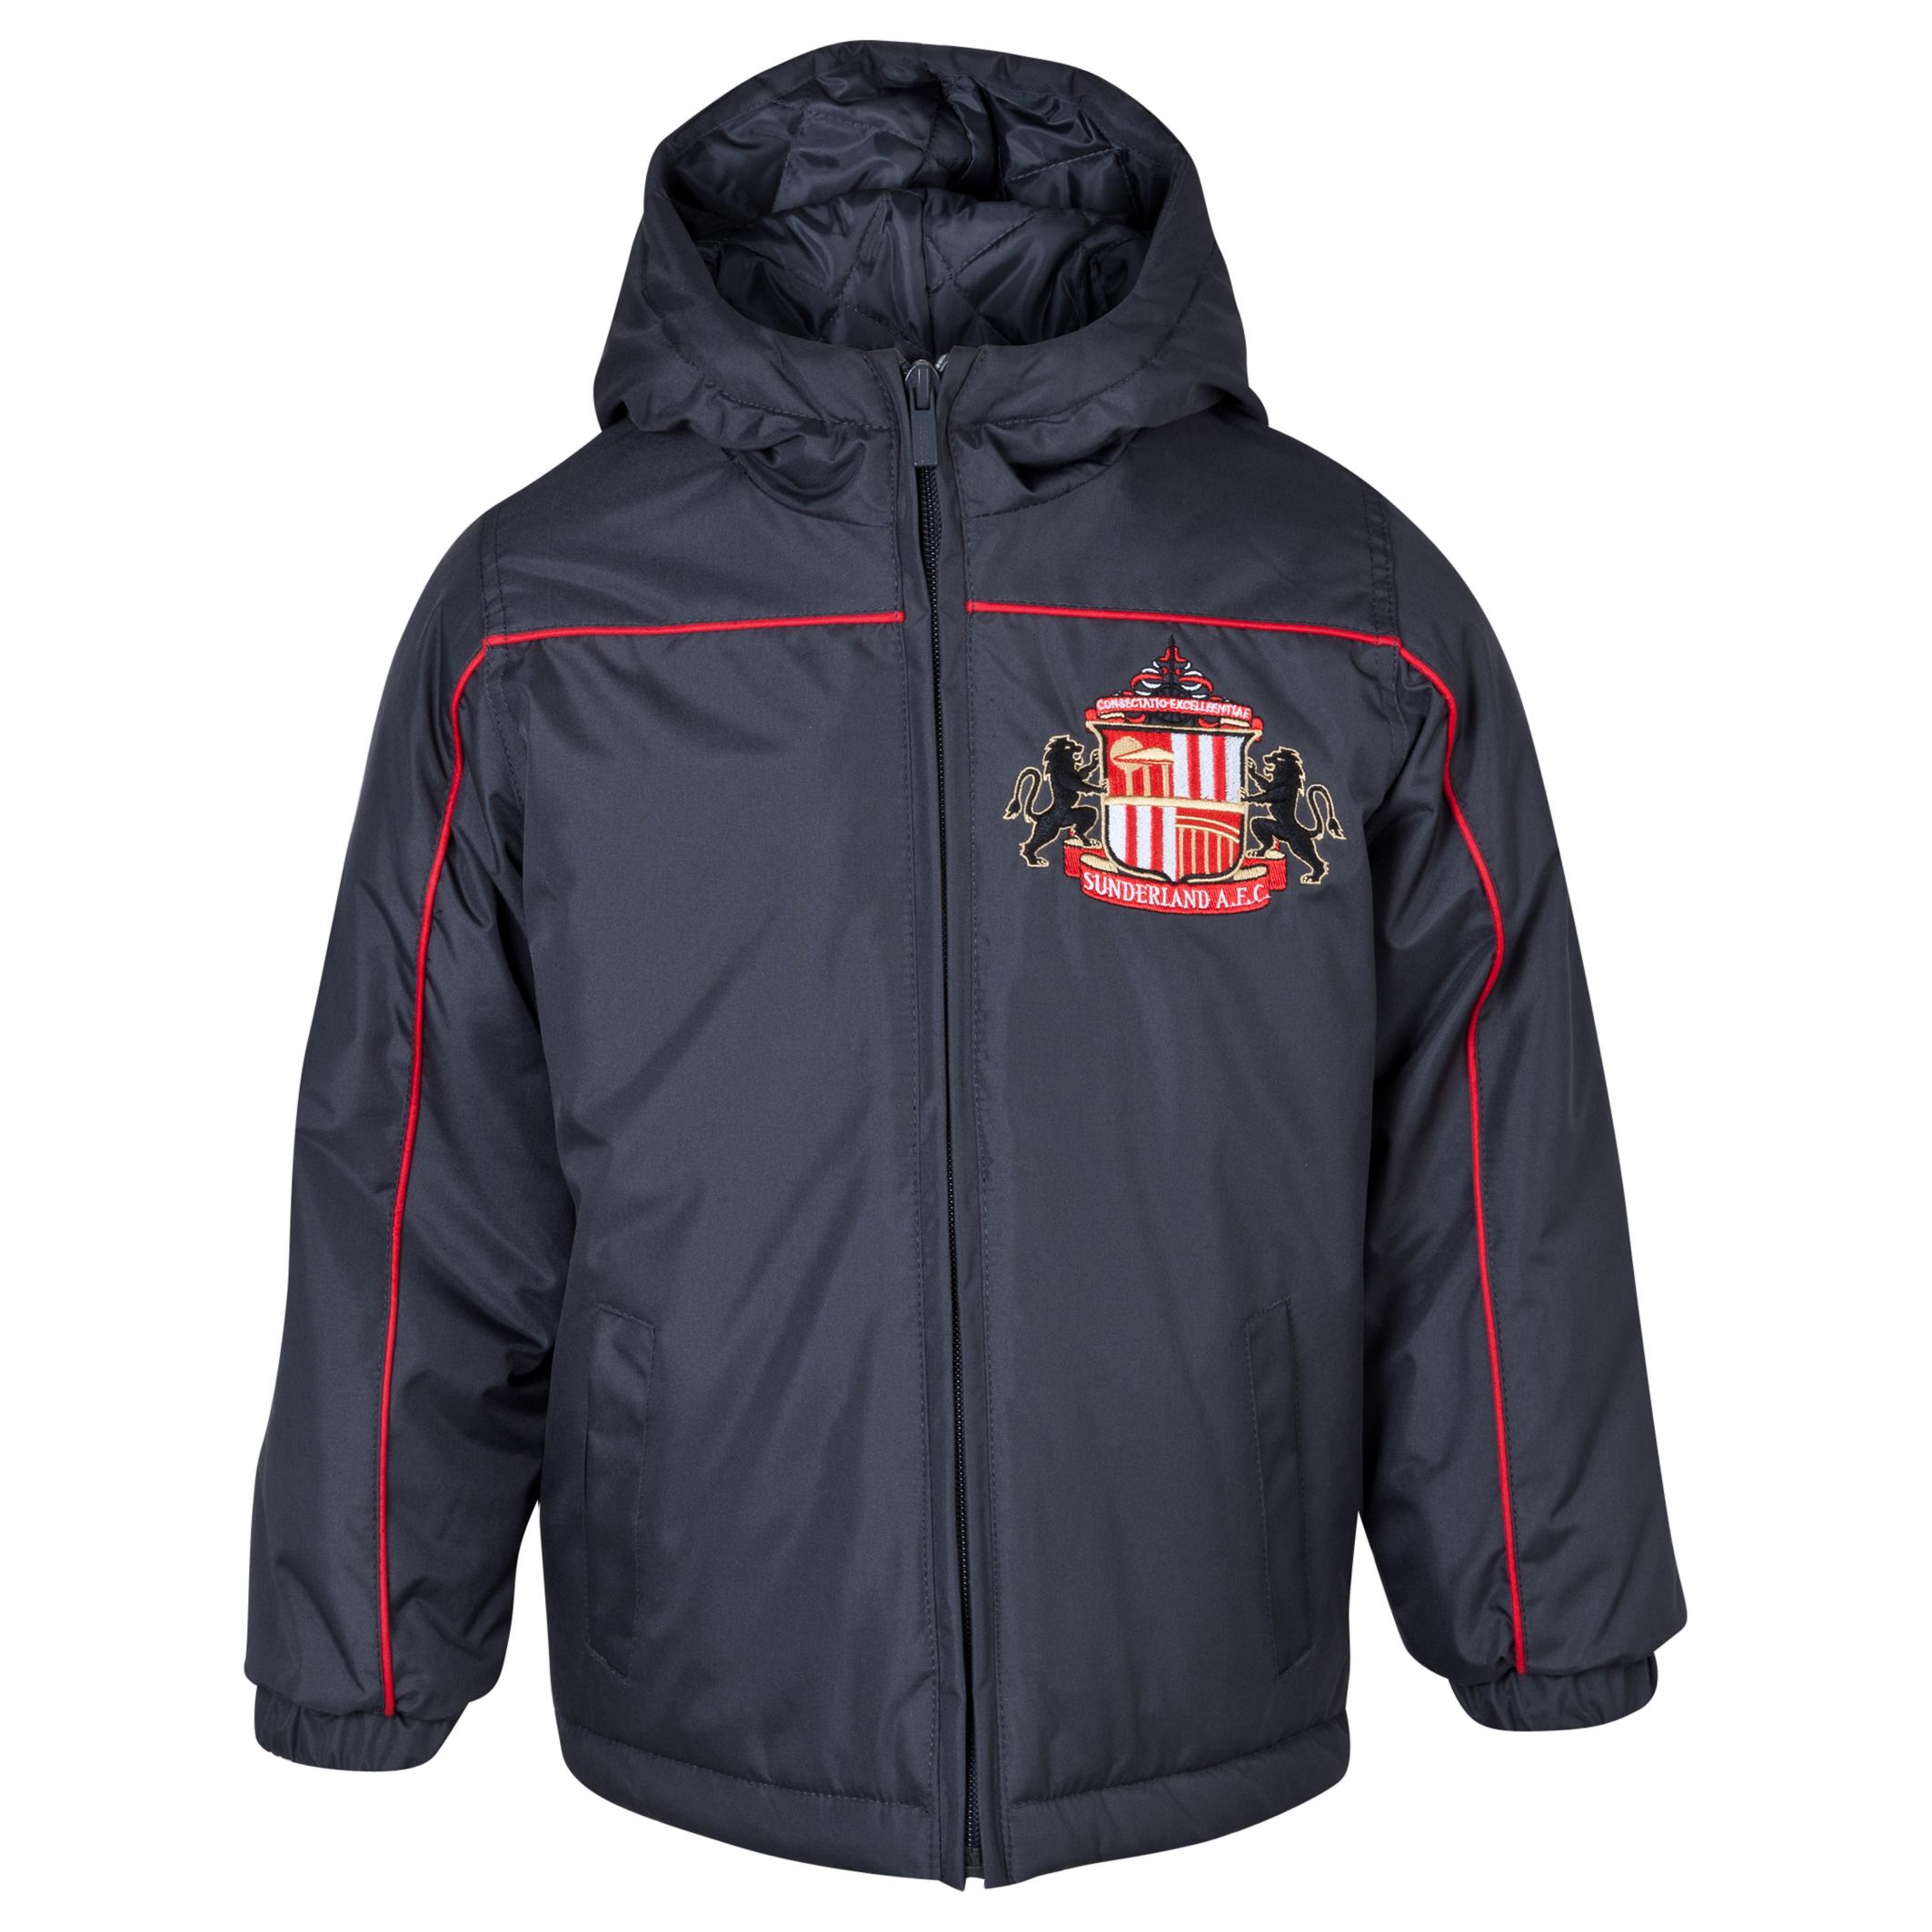 Sunderland Essentials Match Coat - Infant Boys Dk Grey